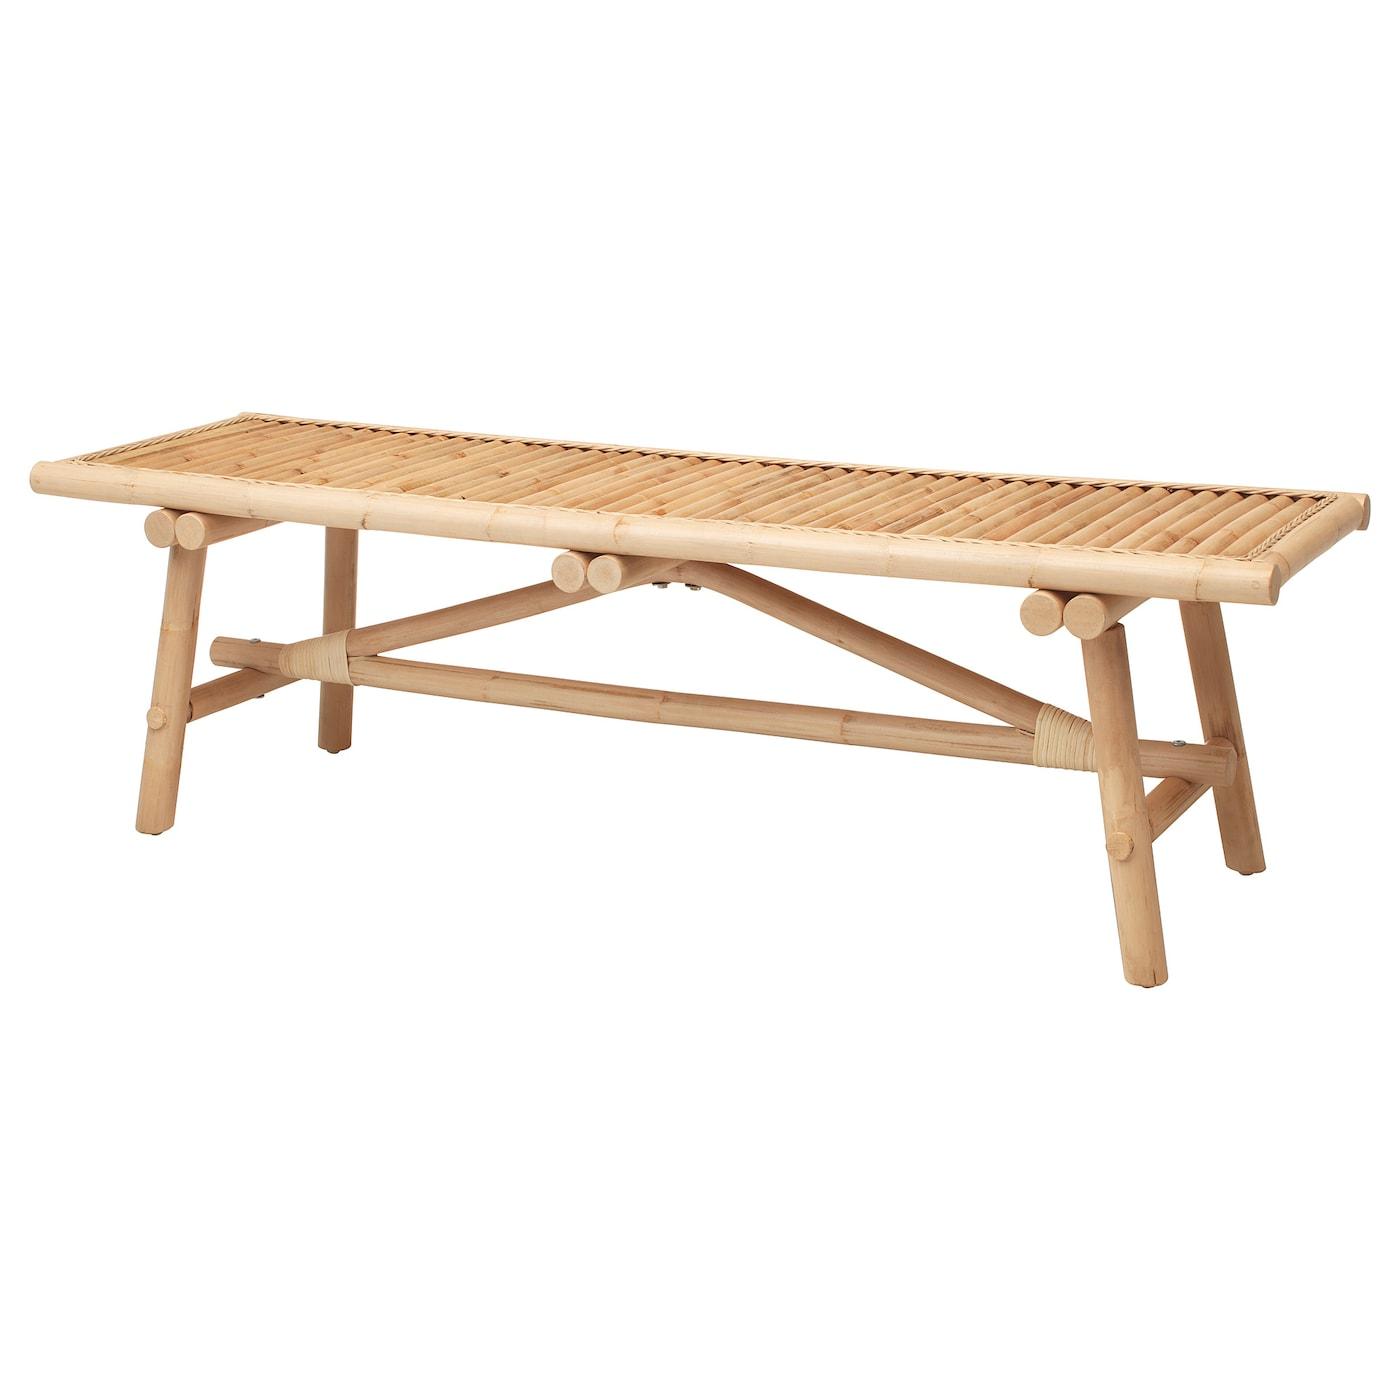 Ikea TÄnkvÄrd Bench